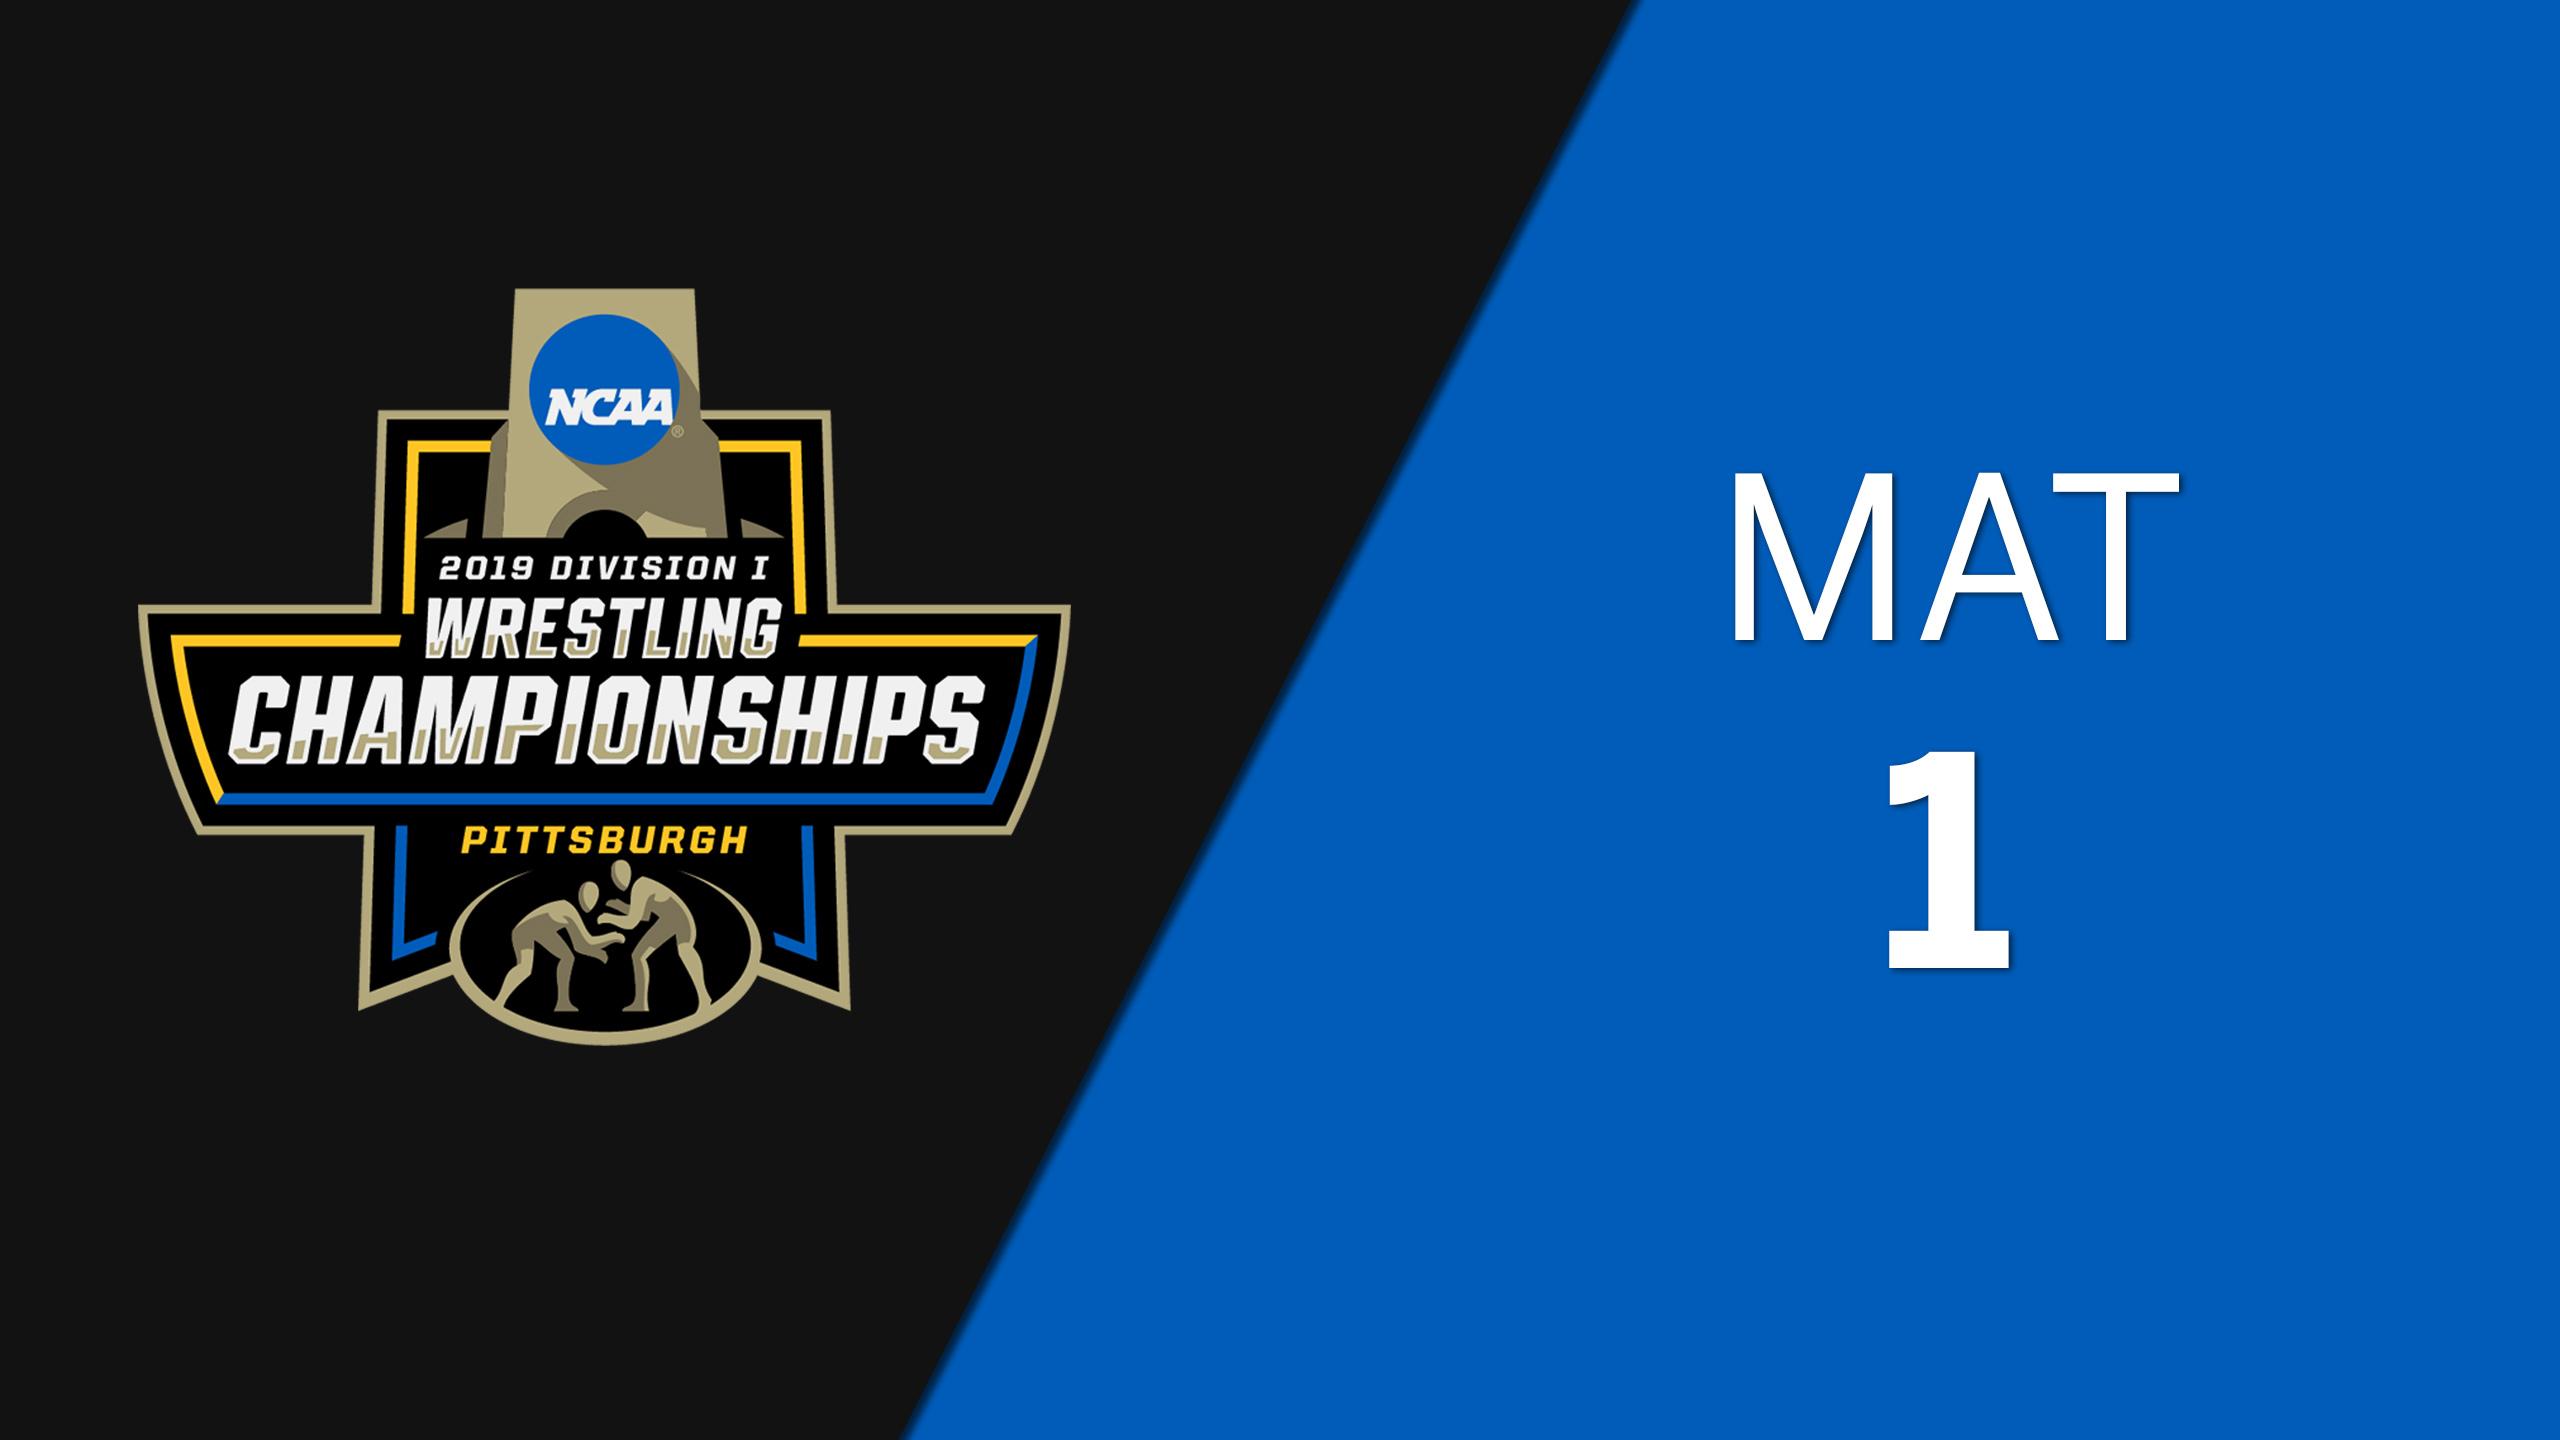 NCAA Wrestling Championship (Mat 1, First Round)